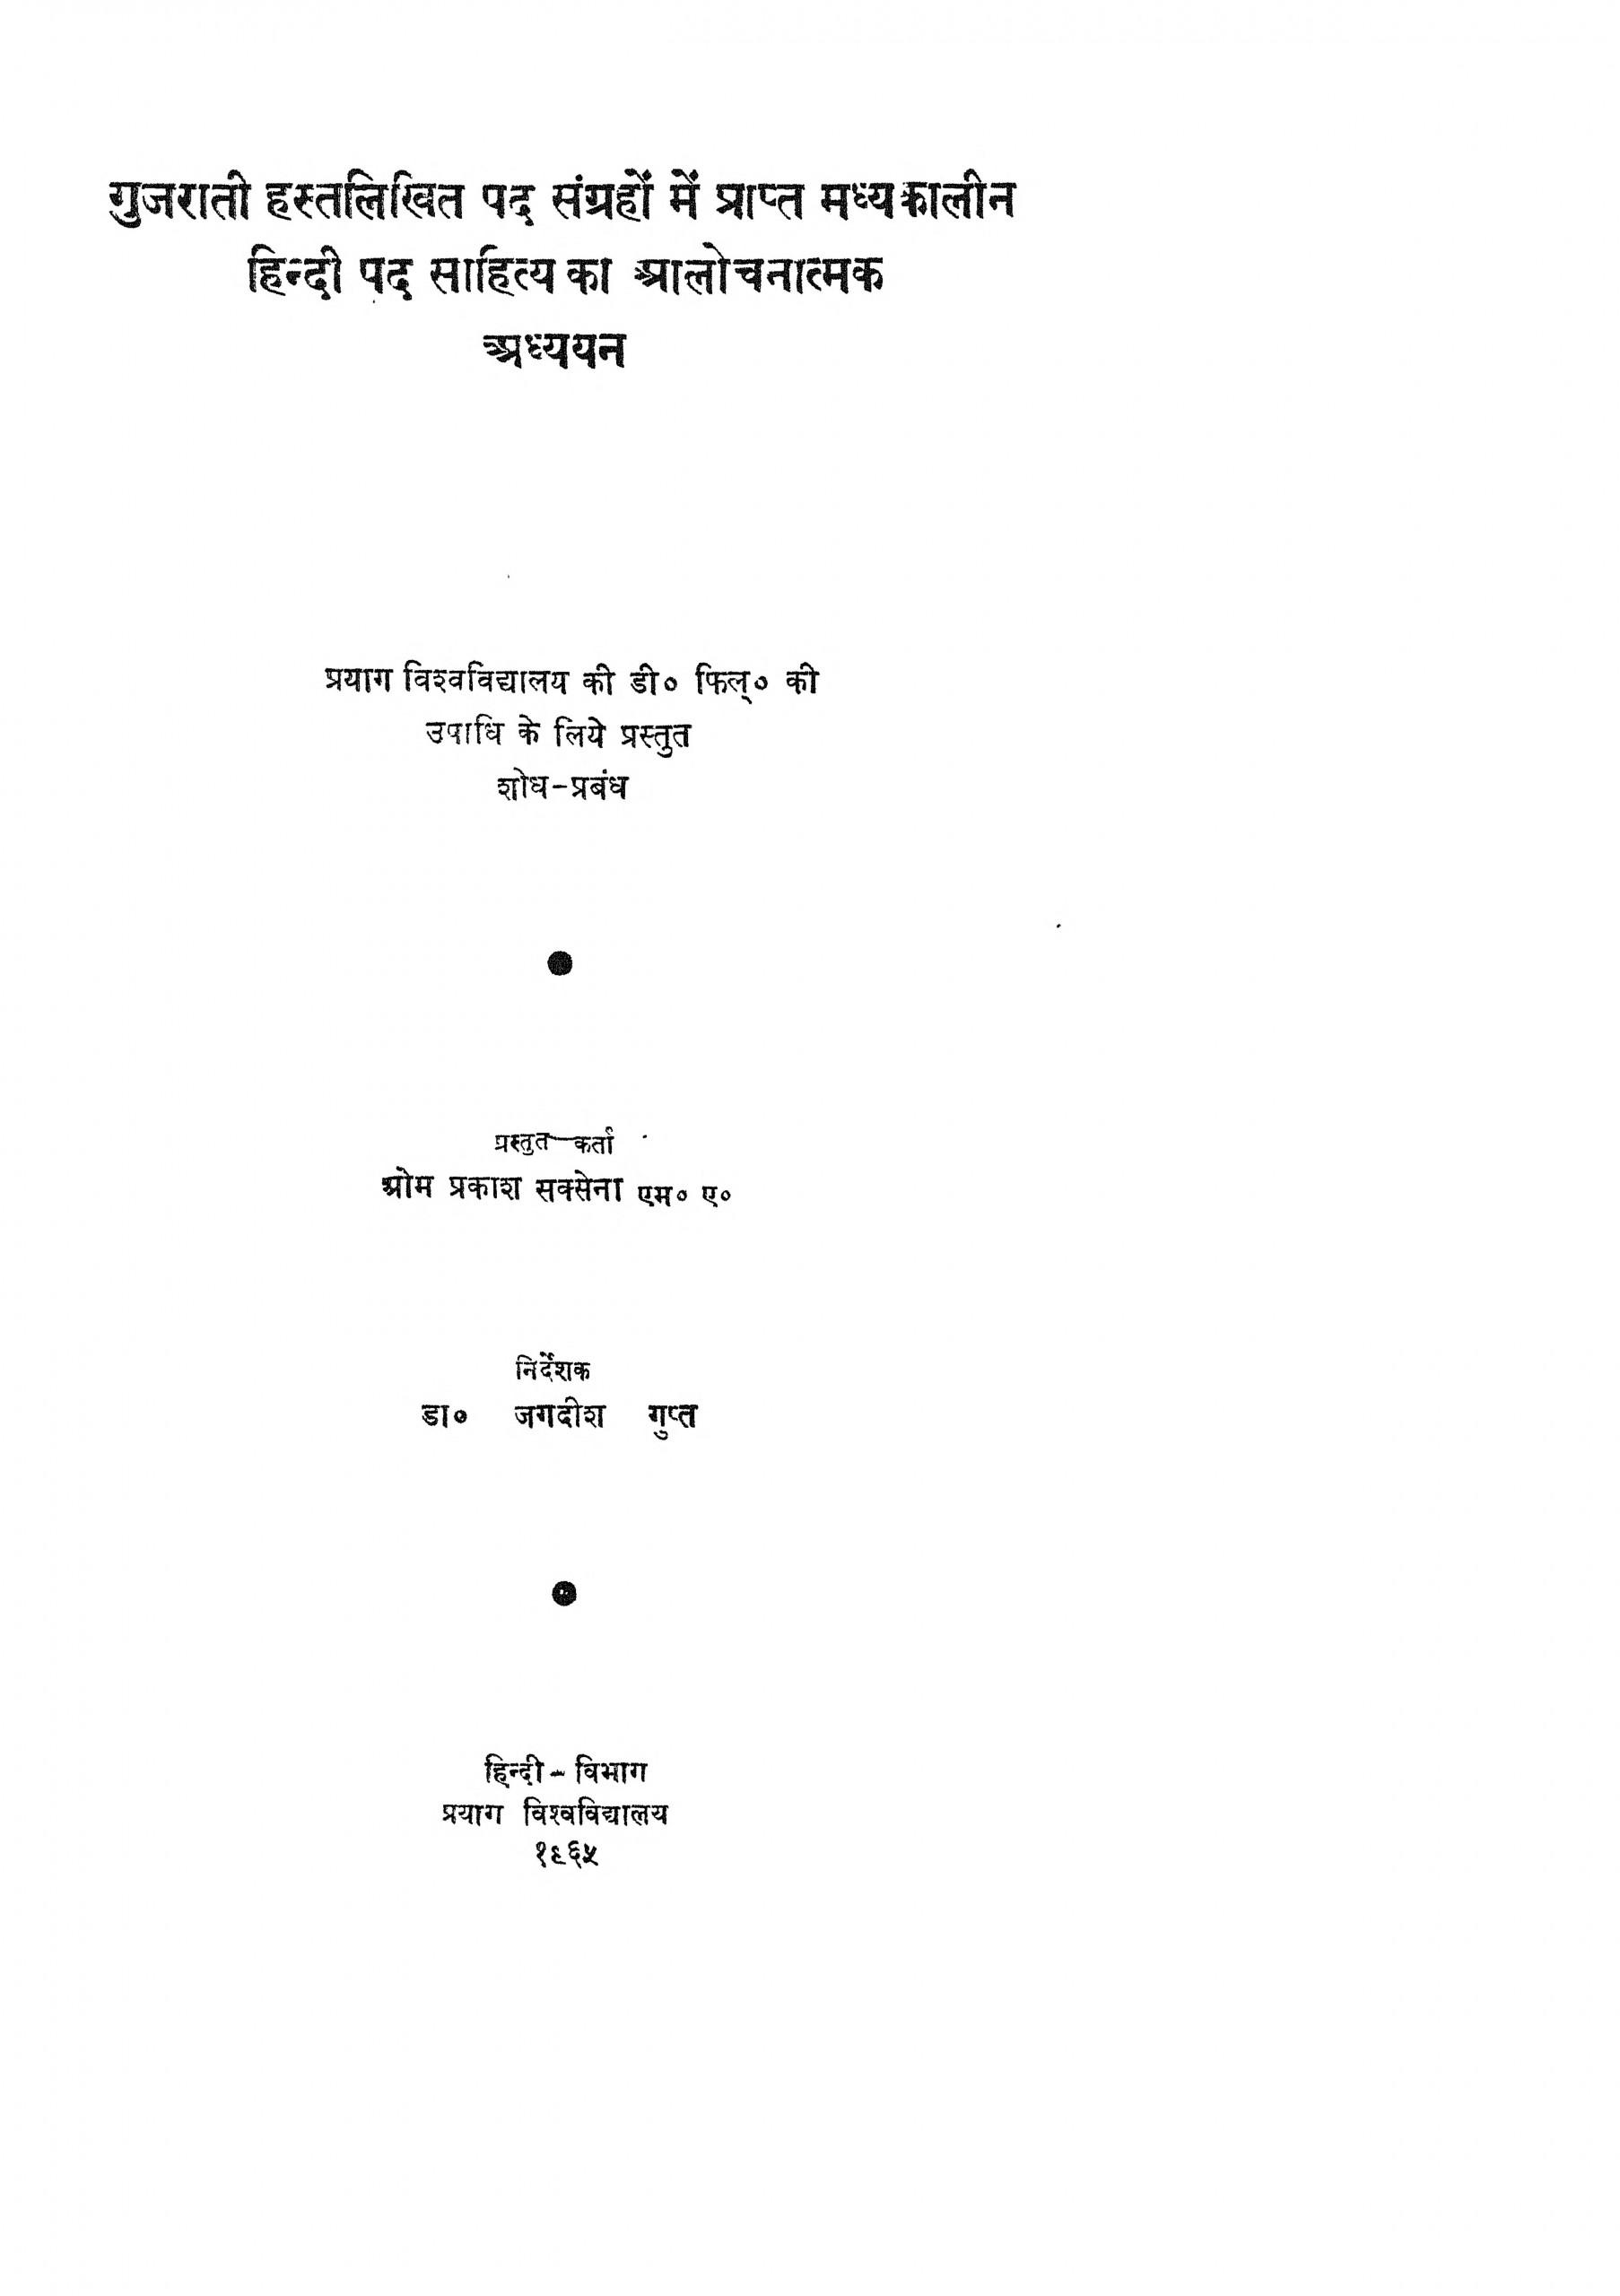 Book Image : गुजराती हस्तलिखित पद संग्रहों में प्राप्त मध्यकालीन हिन्दी पद साहित्य का आलोचनात्मक अध्ययन - Gujarati Hastalikhit Pad Sangrahon Men Prapt Madhyakalin Hindi Pad Sahitya Ka Aalochanatmak Adhyayan